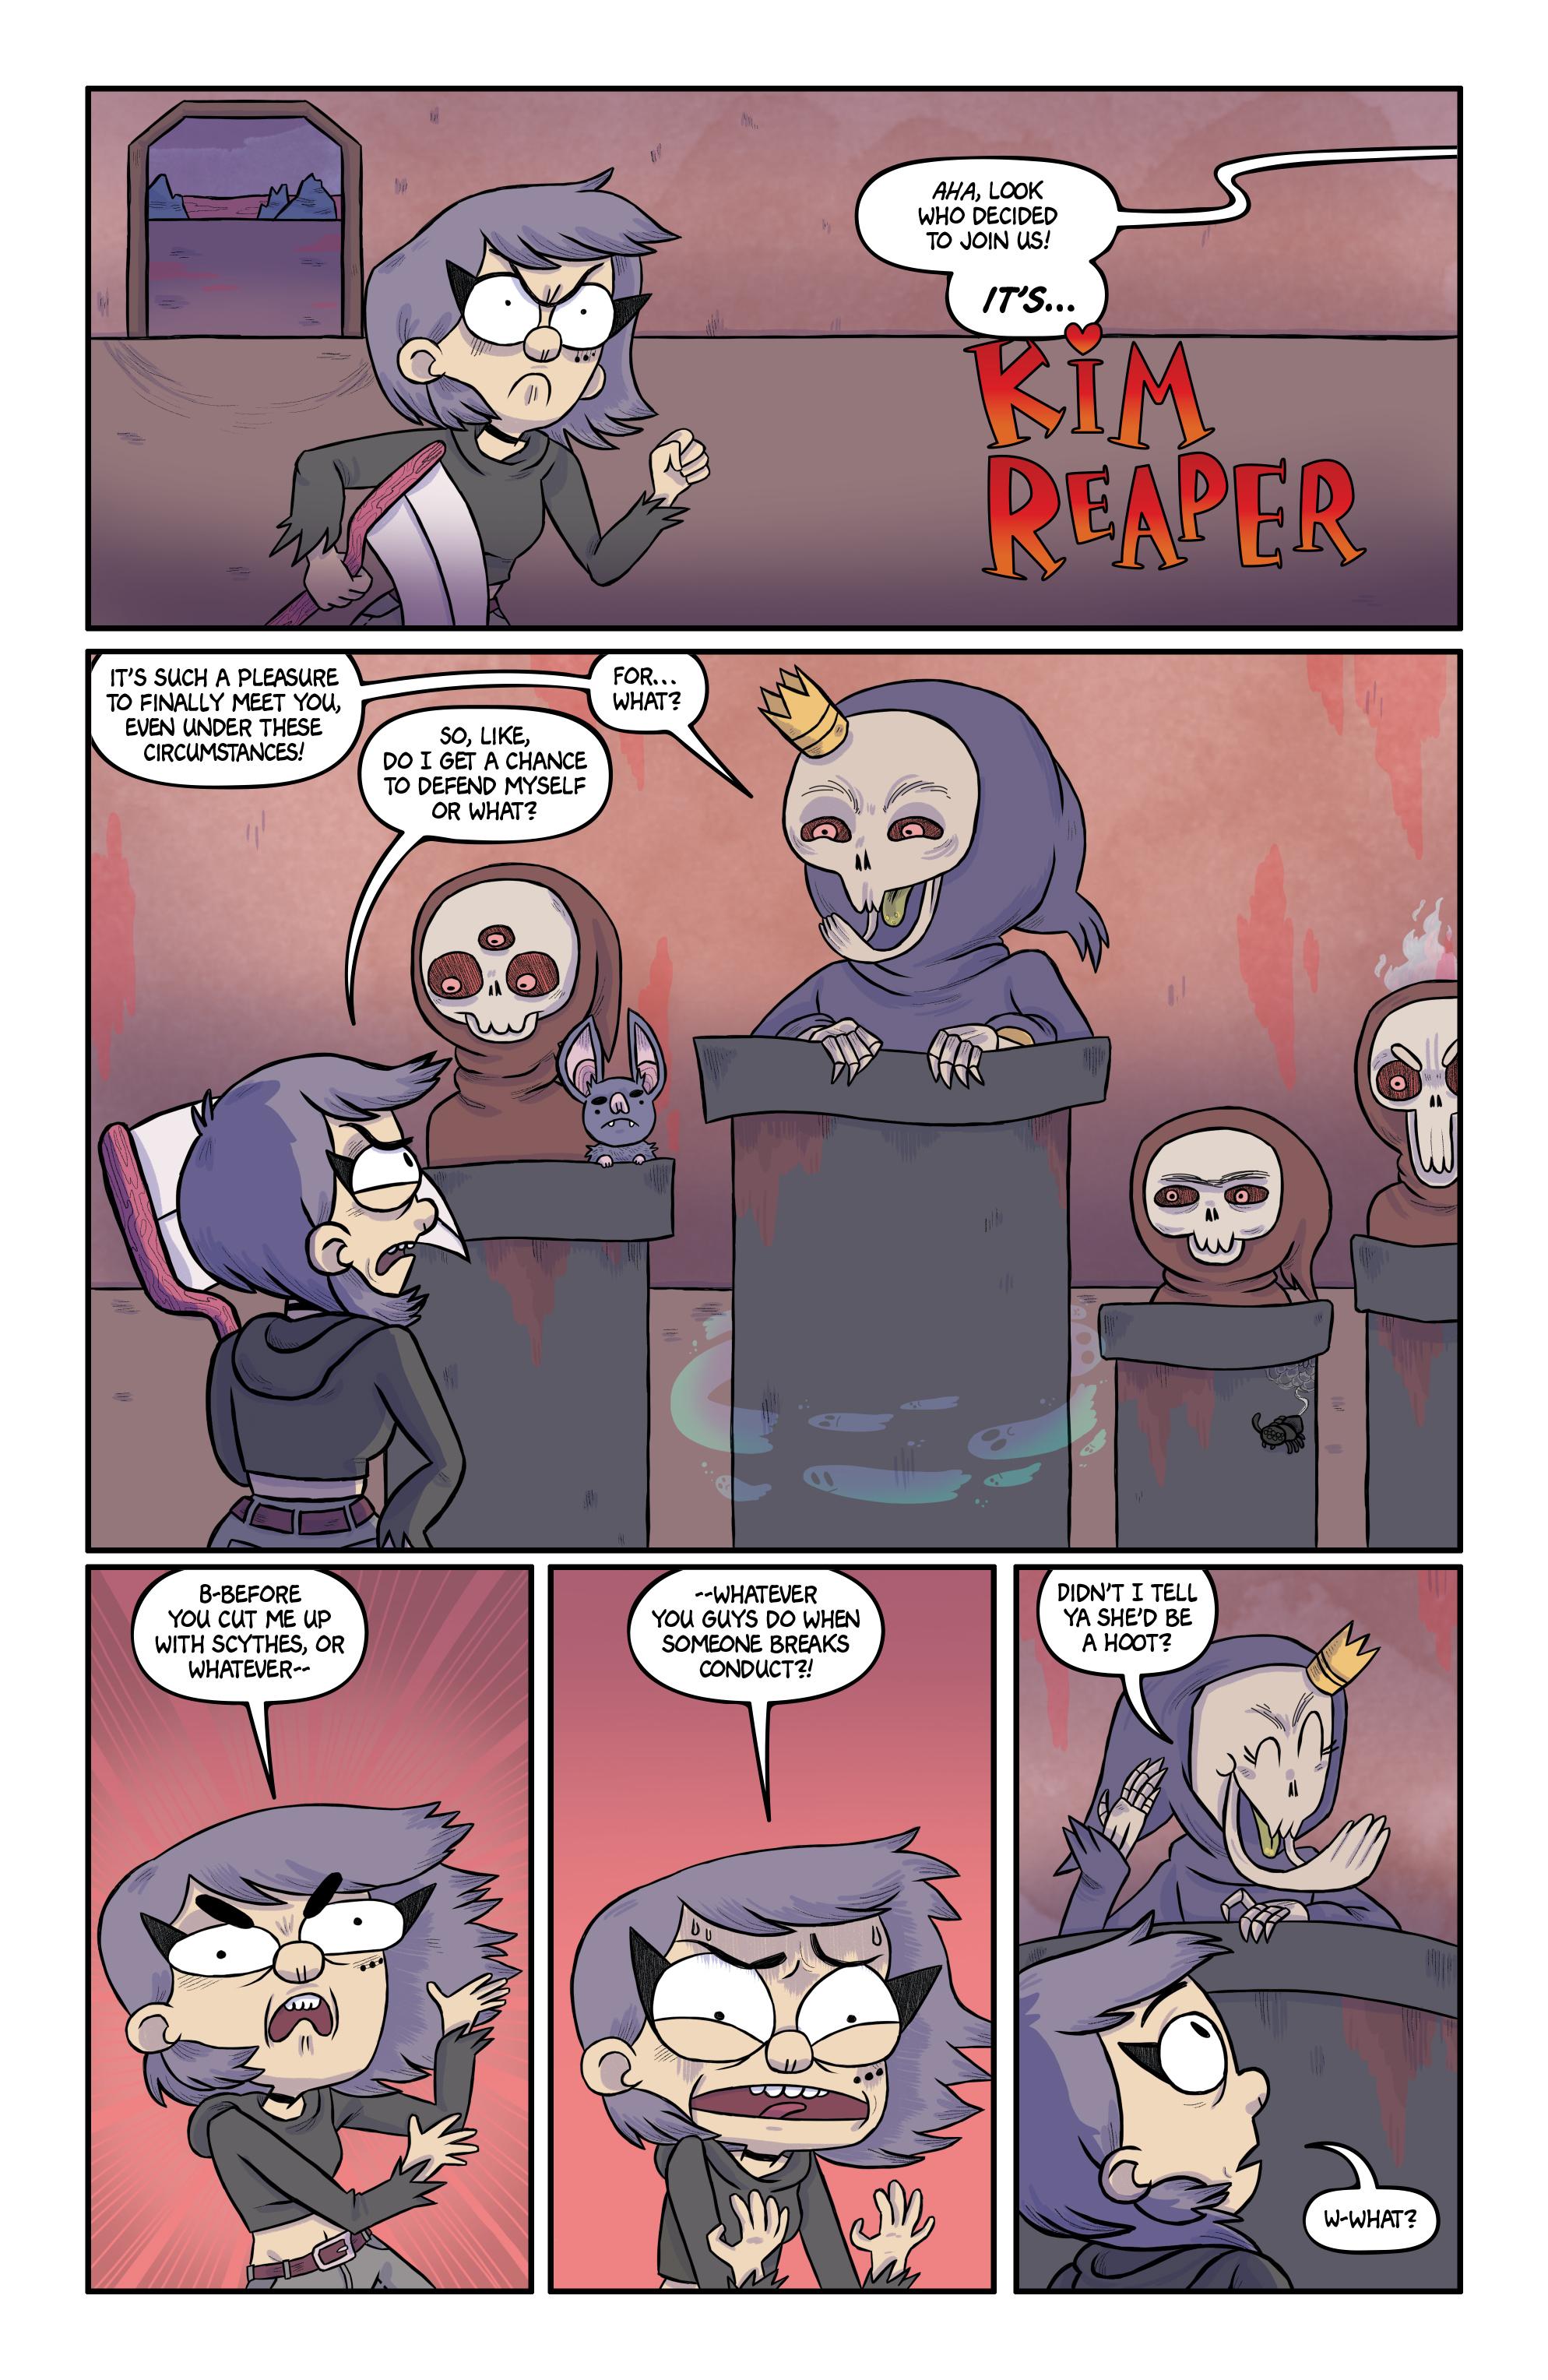 Read online Kim Reaper comic -  Issue #3 - 6